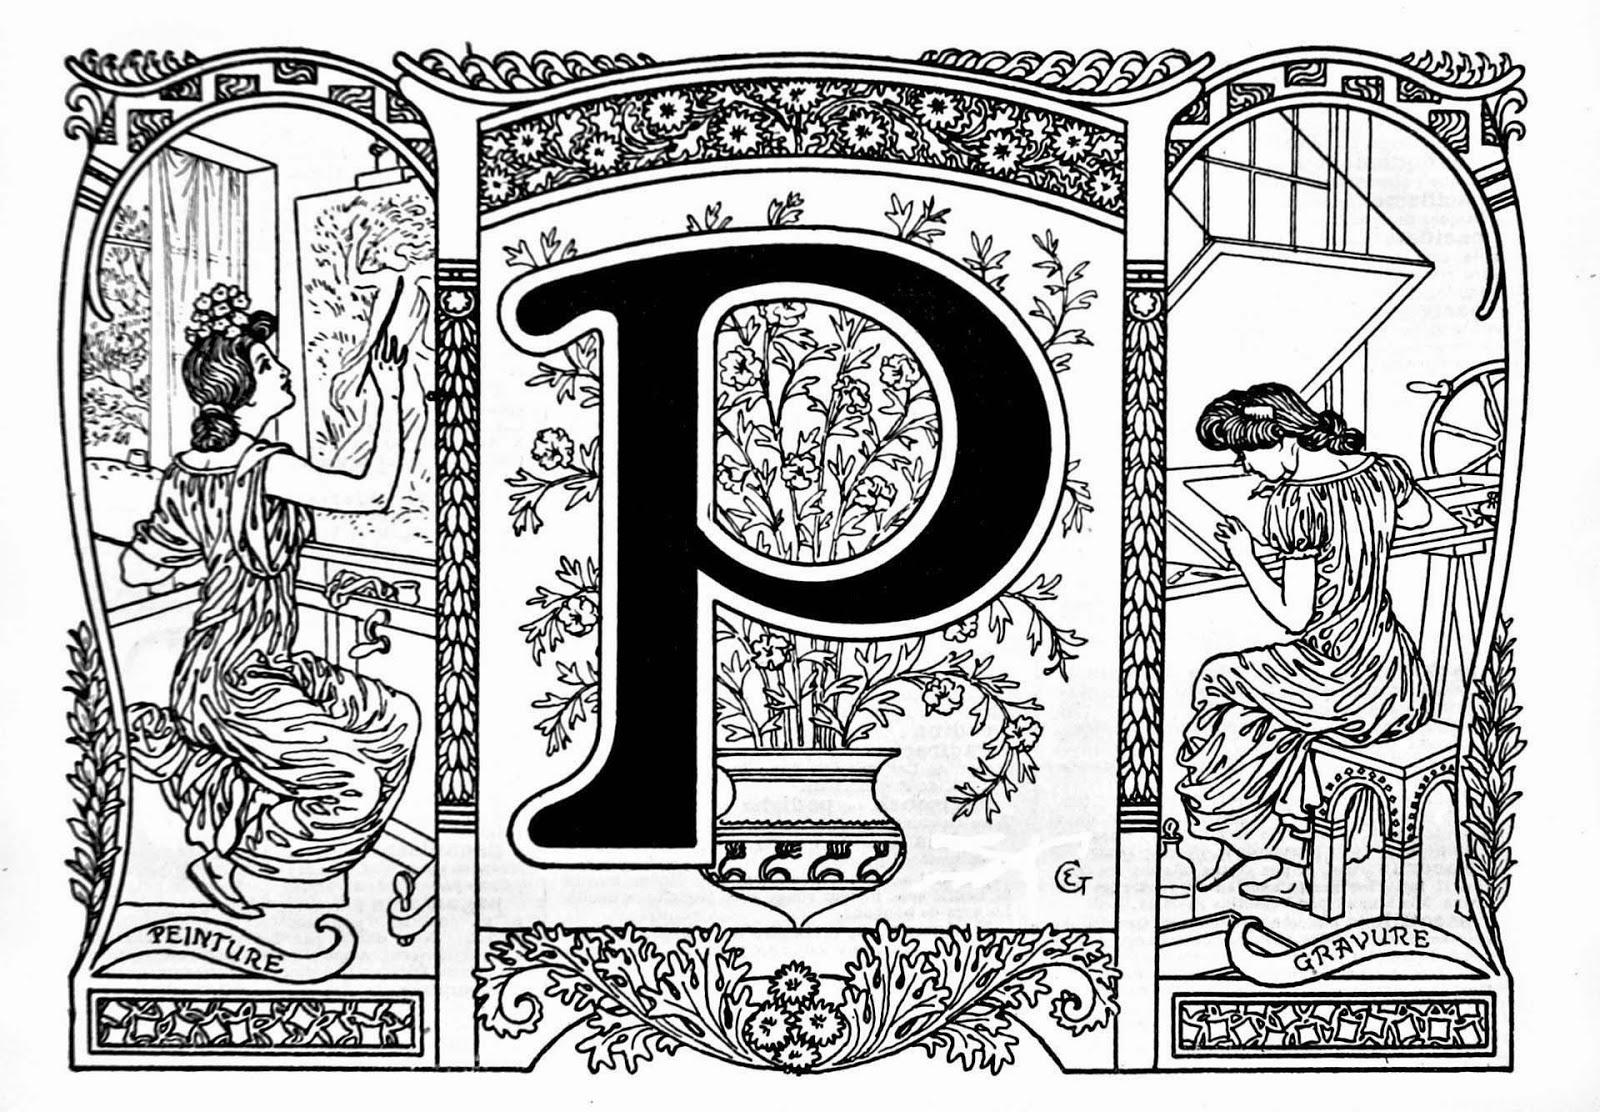 héroïne bretonne en 5 lettres